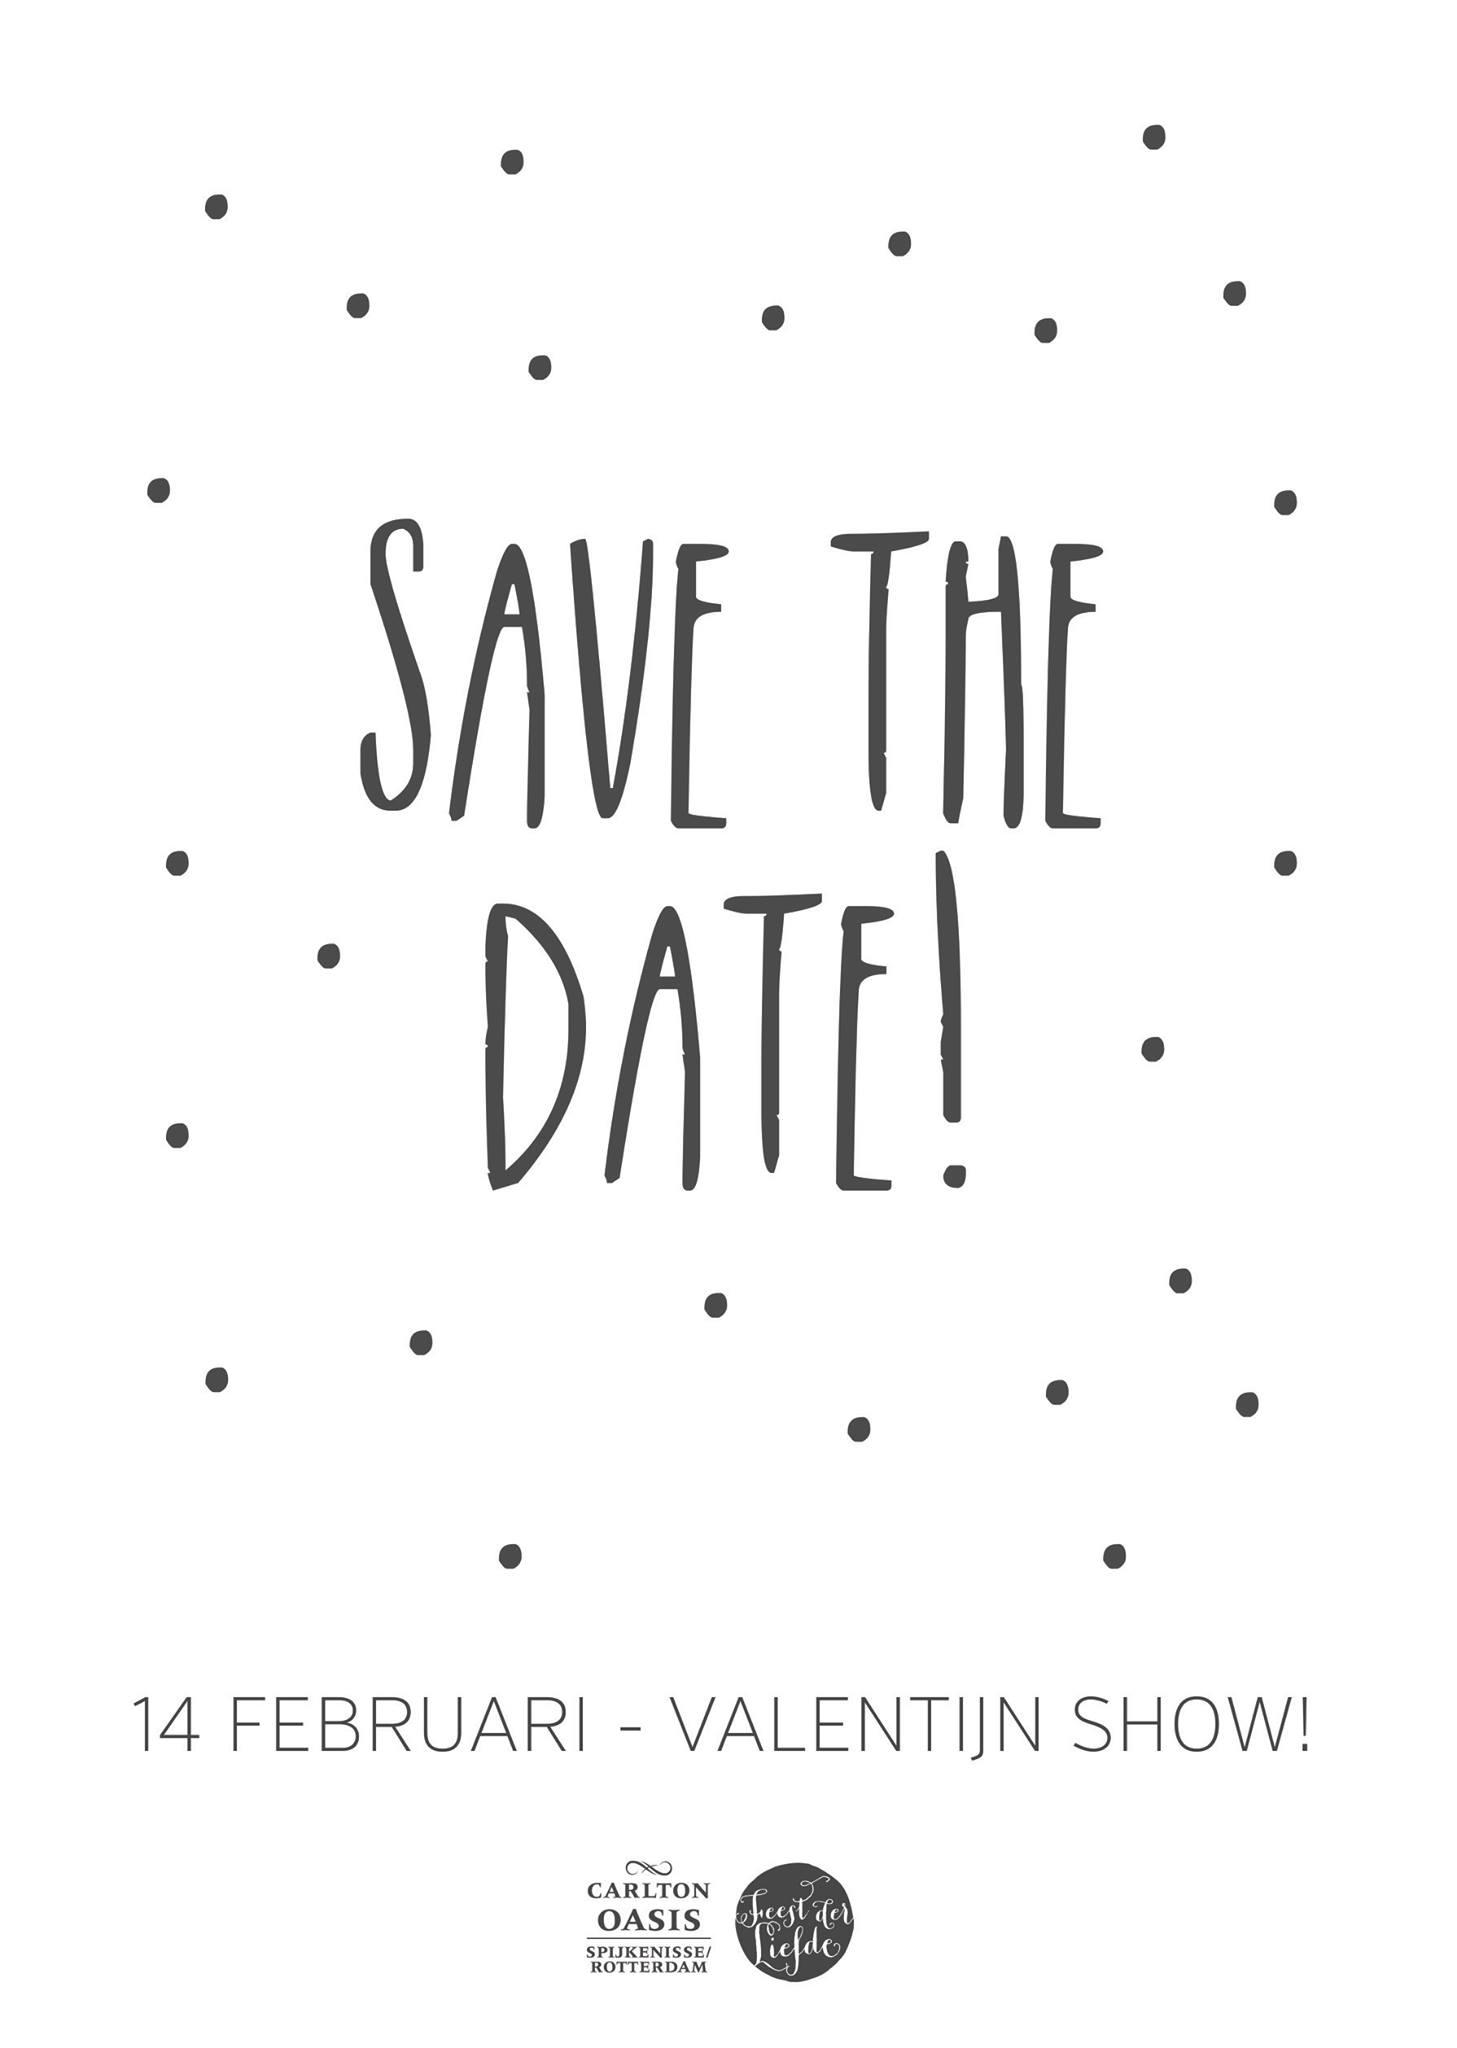 Valentijn Show Feest der Liefde Editie 3 2015